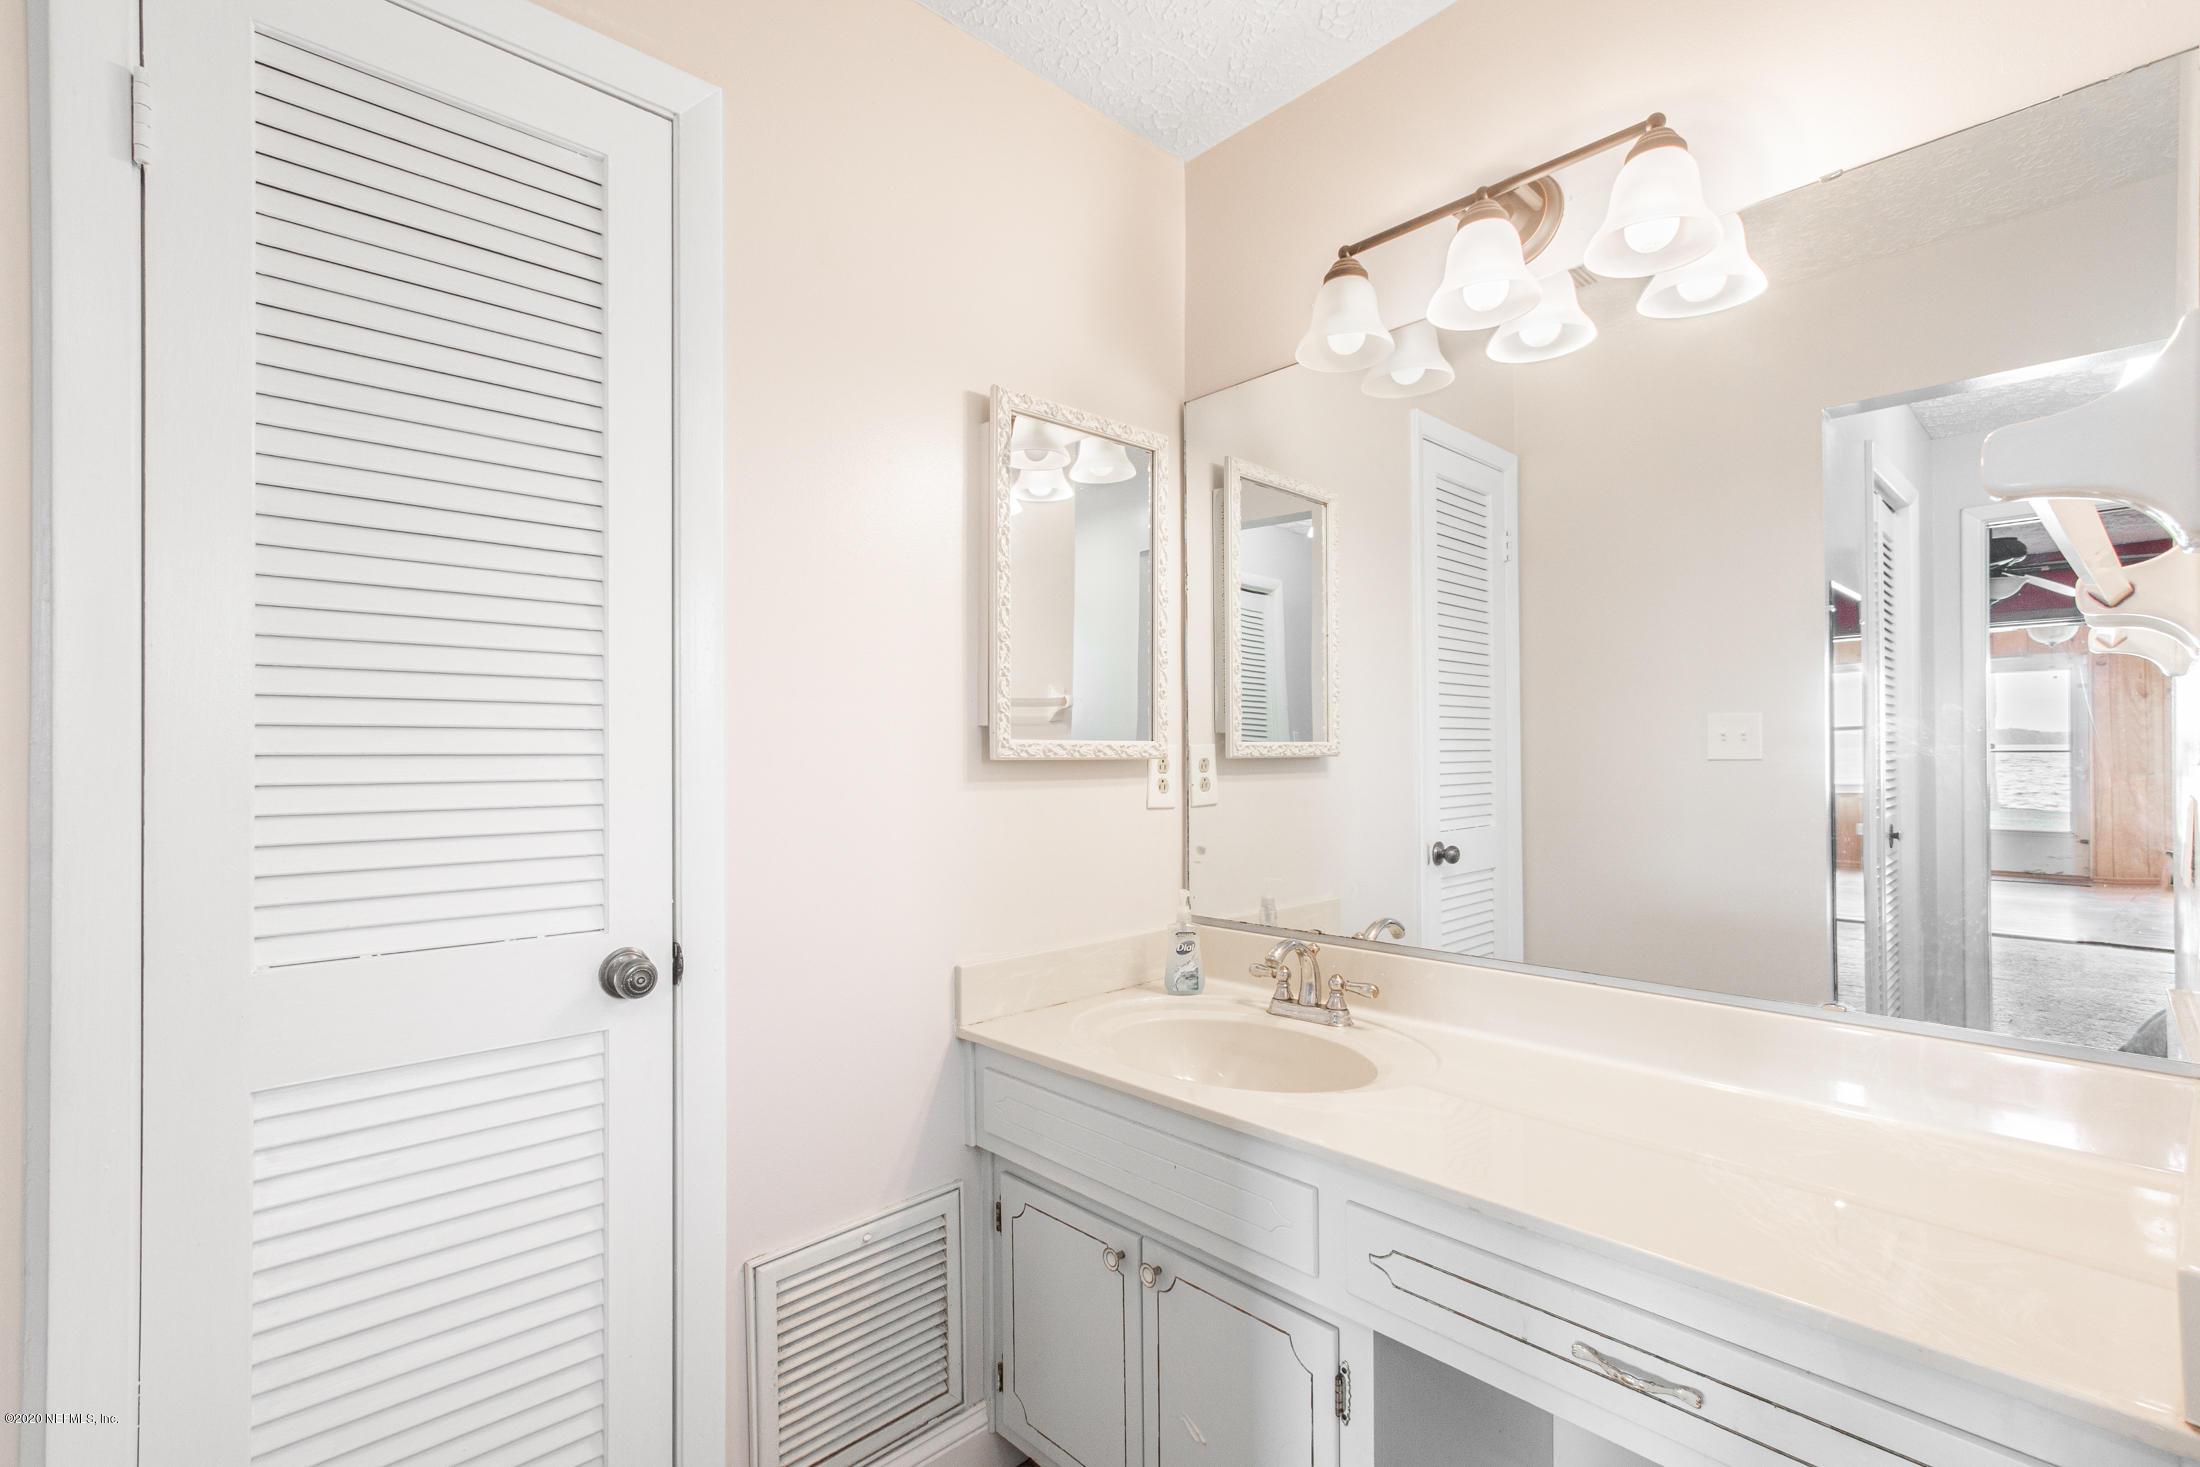 138 CYPRESS, EAST PALATKA, FLORIDA 32131, 3 Bedrooms Bedrooms, ,2 BathroomsBathrooms,Residential,For sale,CYPRESS,1080790